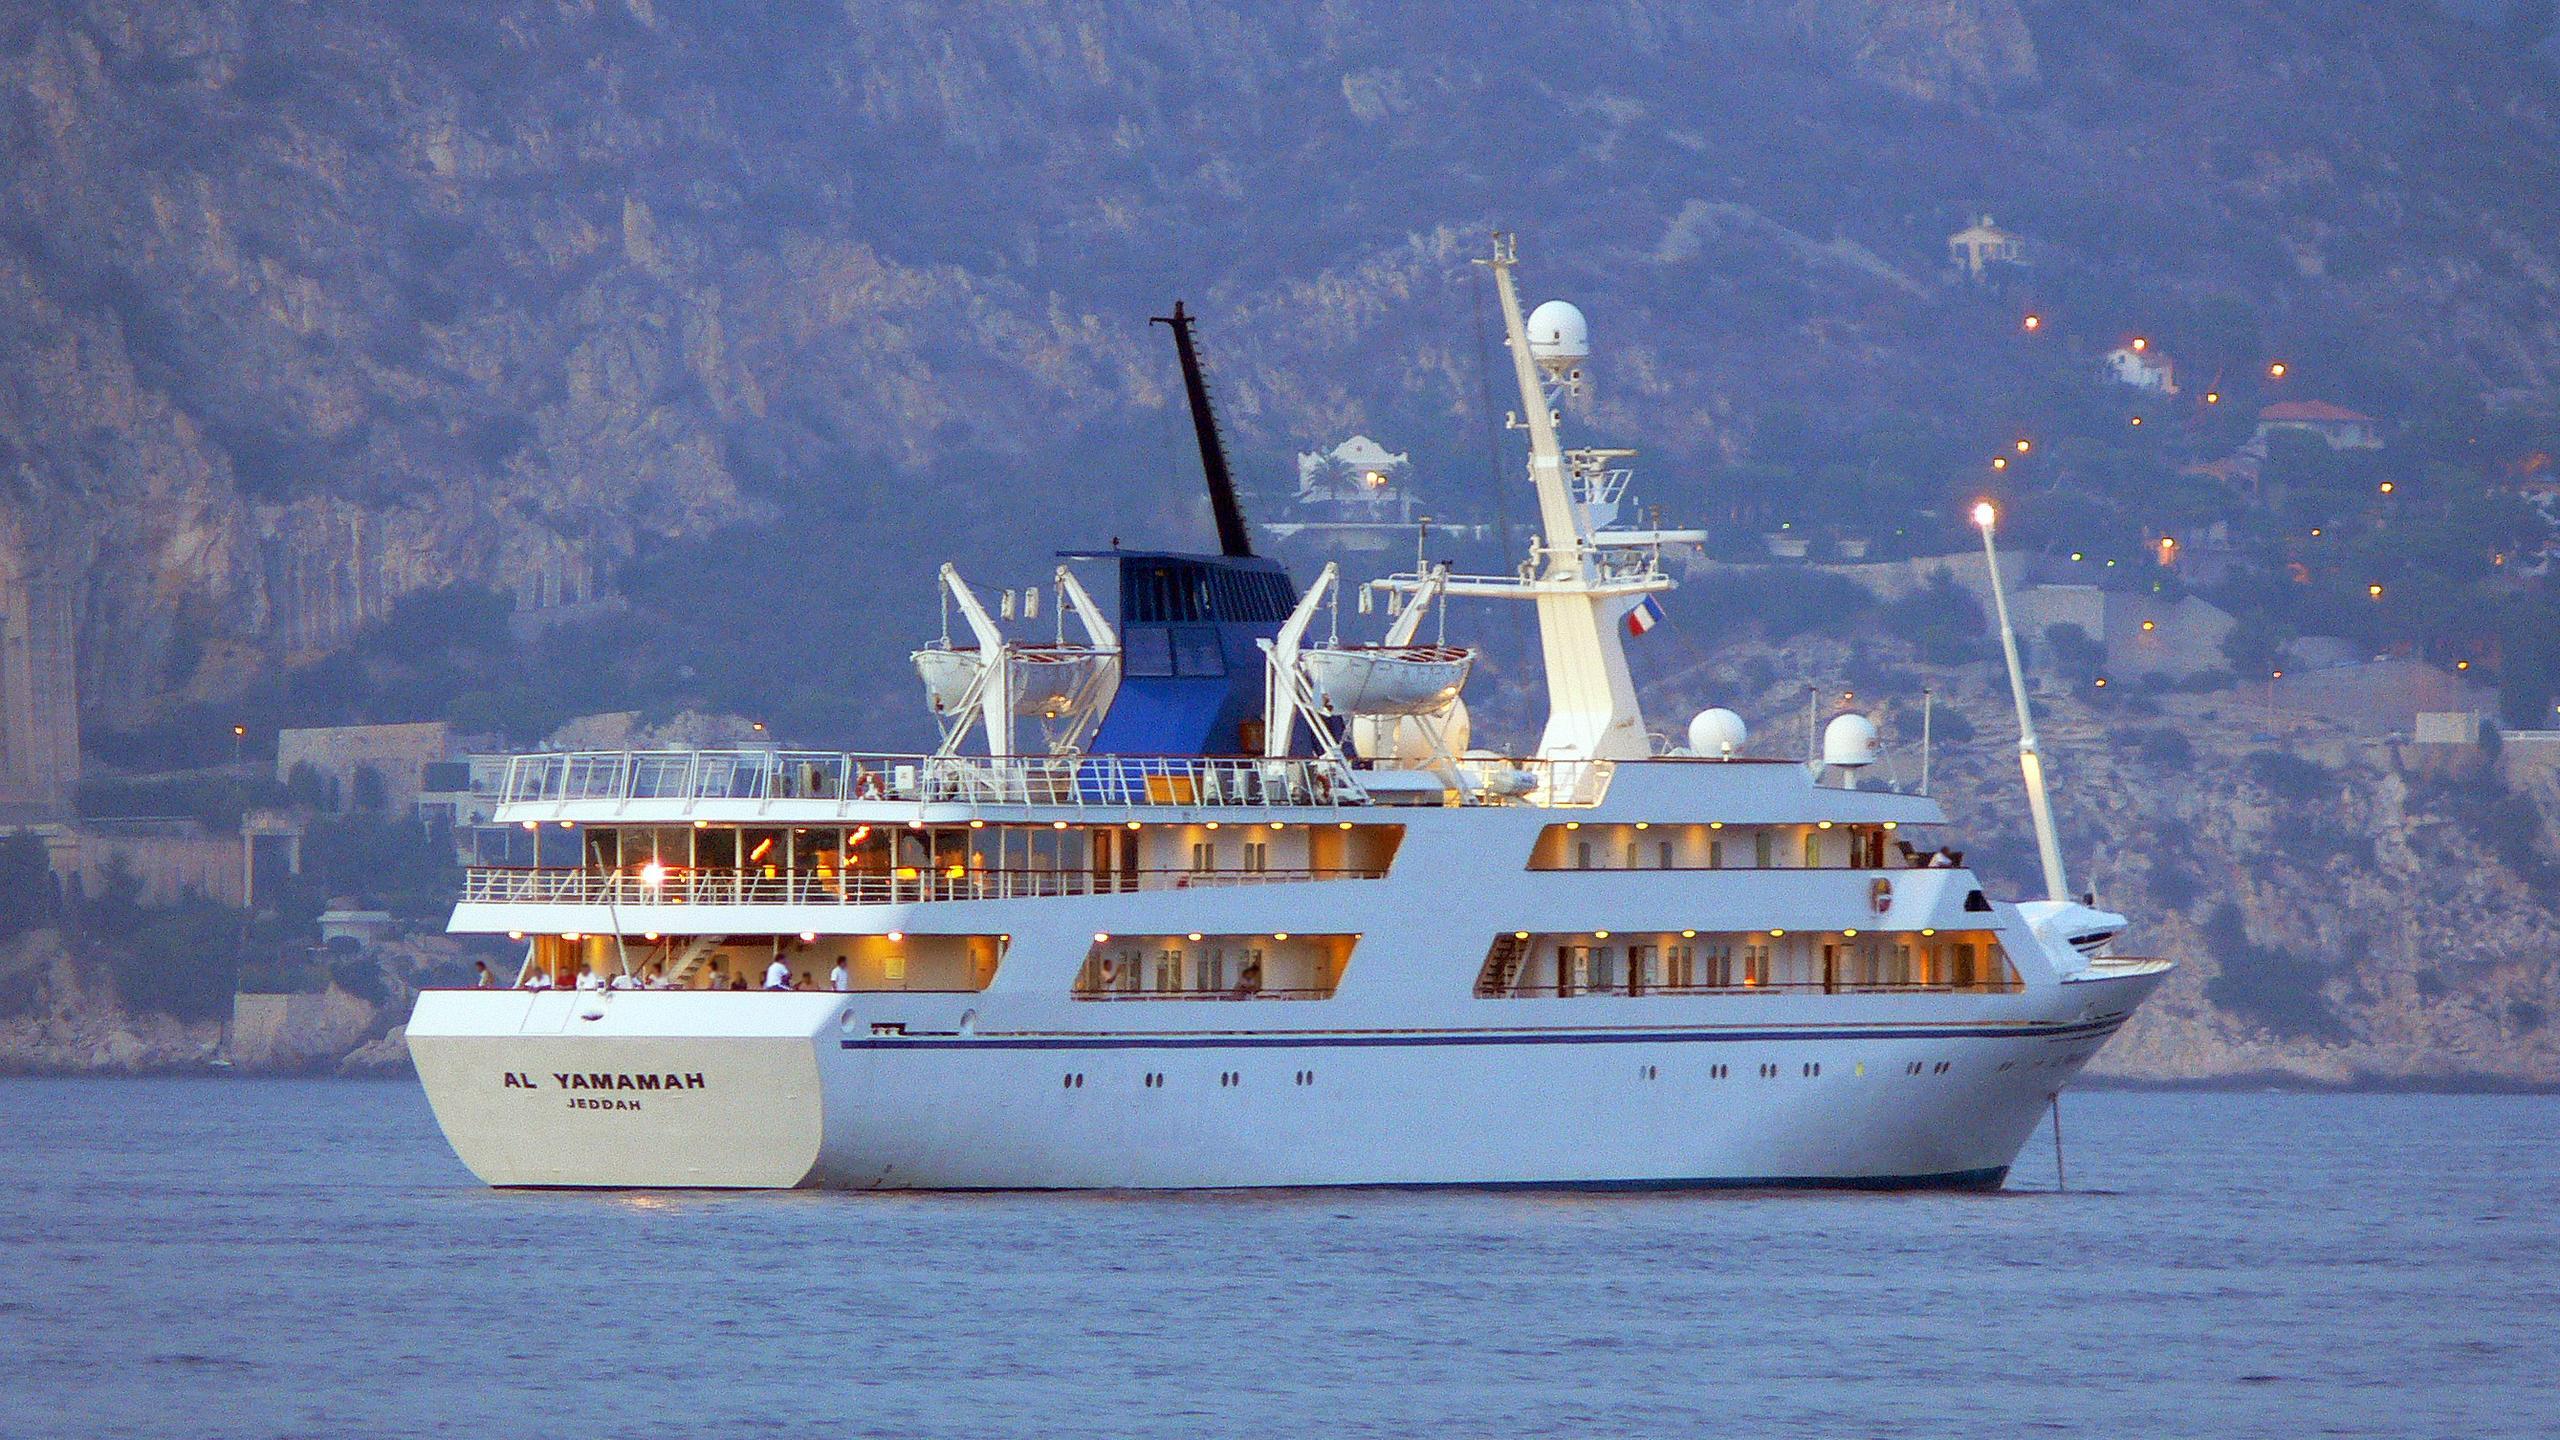 basrah-breeze-motor-yacht-helsingor-vaerft-1981-82m-stern